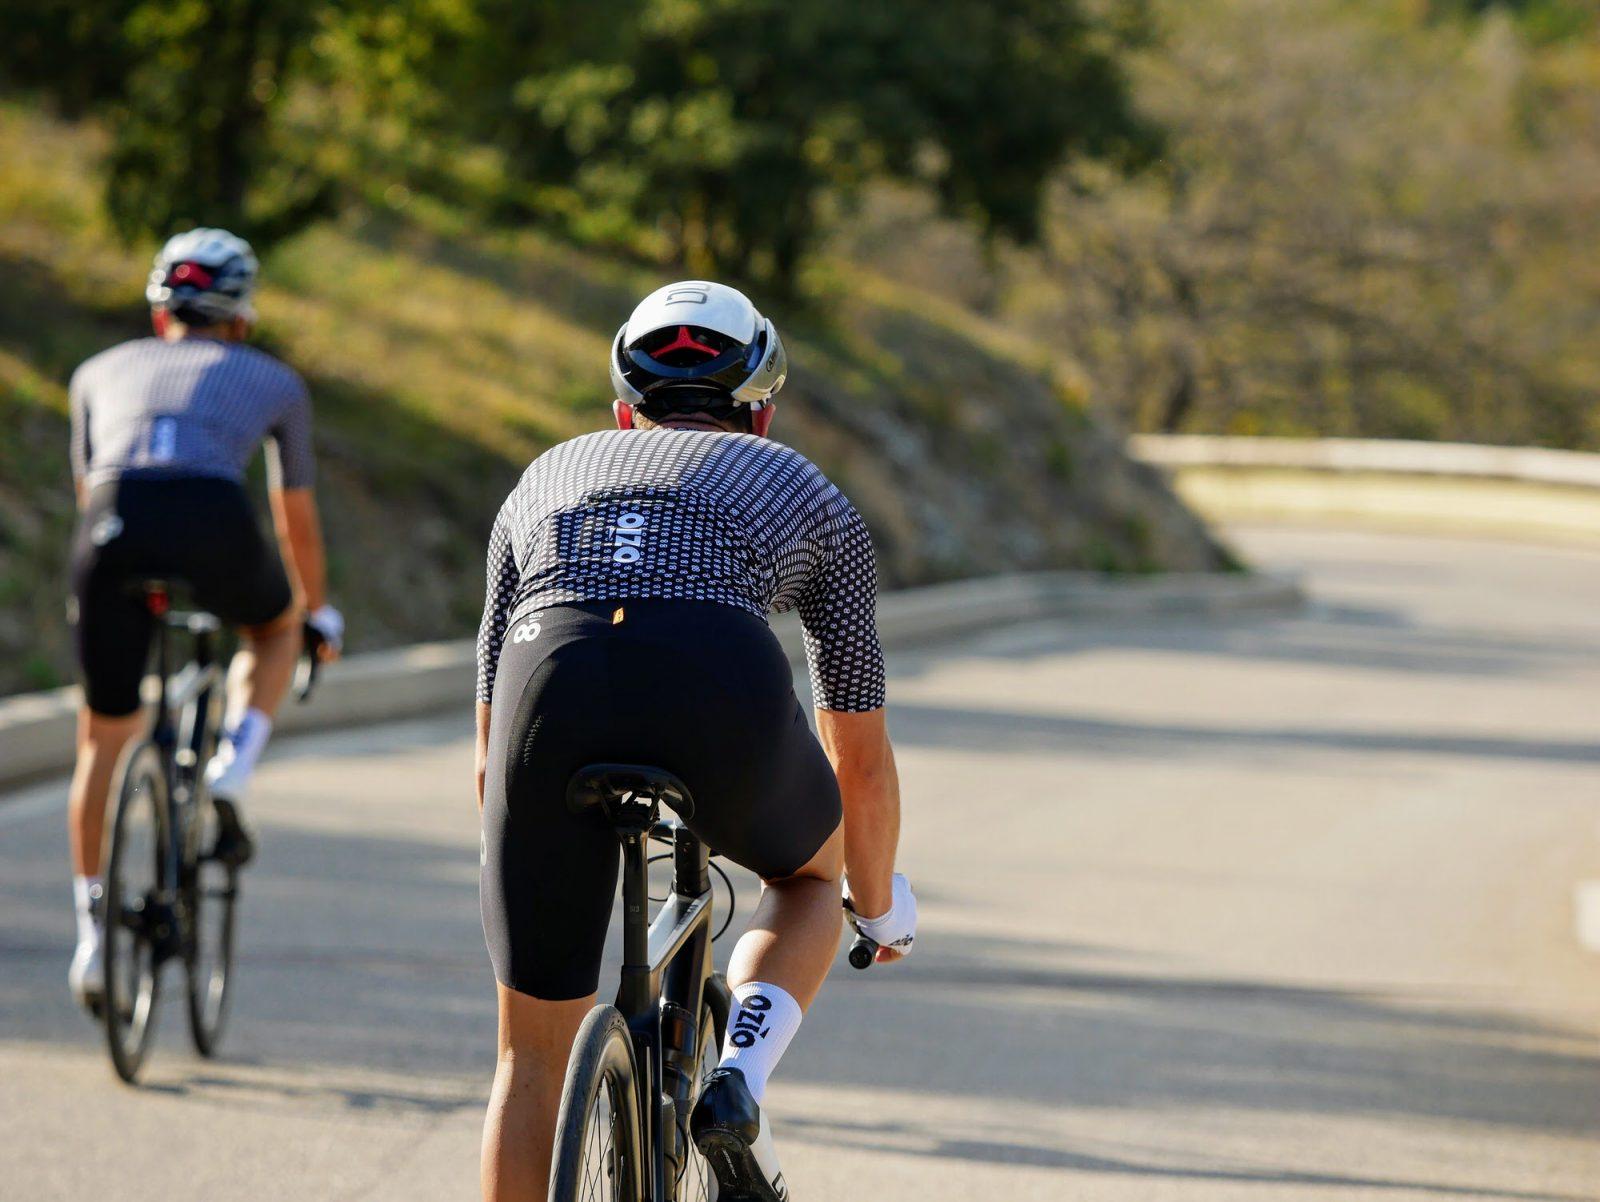 Maillot cycliste été homme de dos OZIO